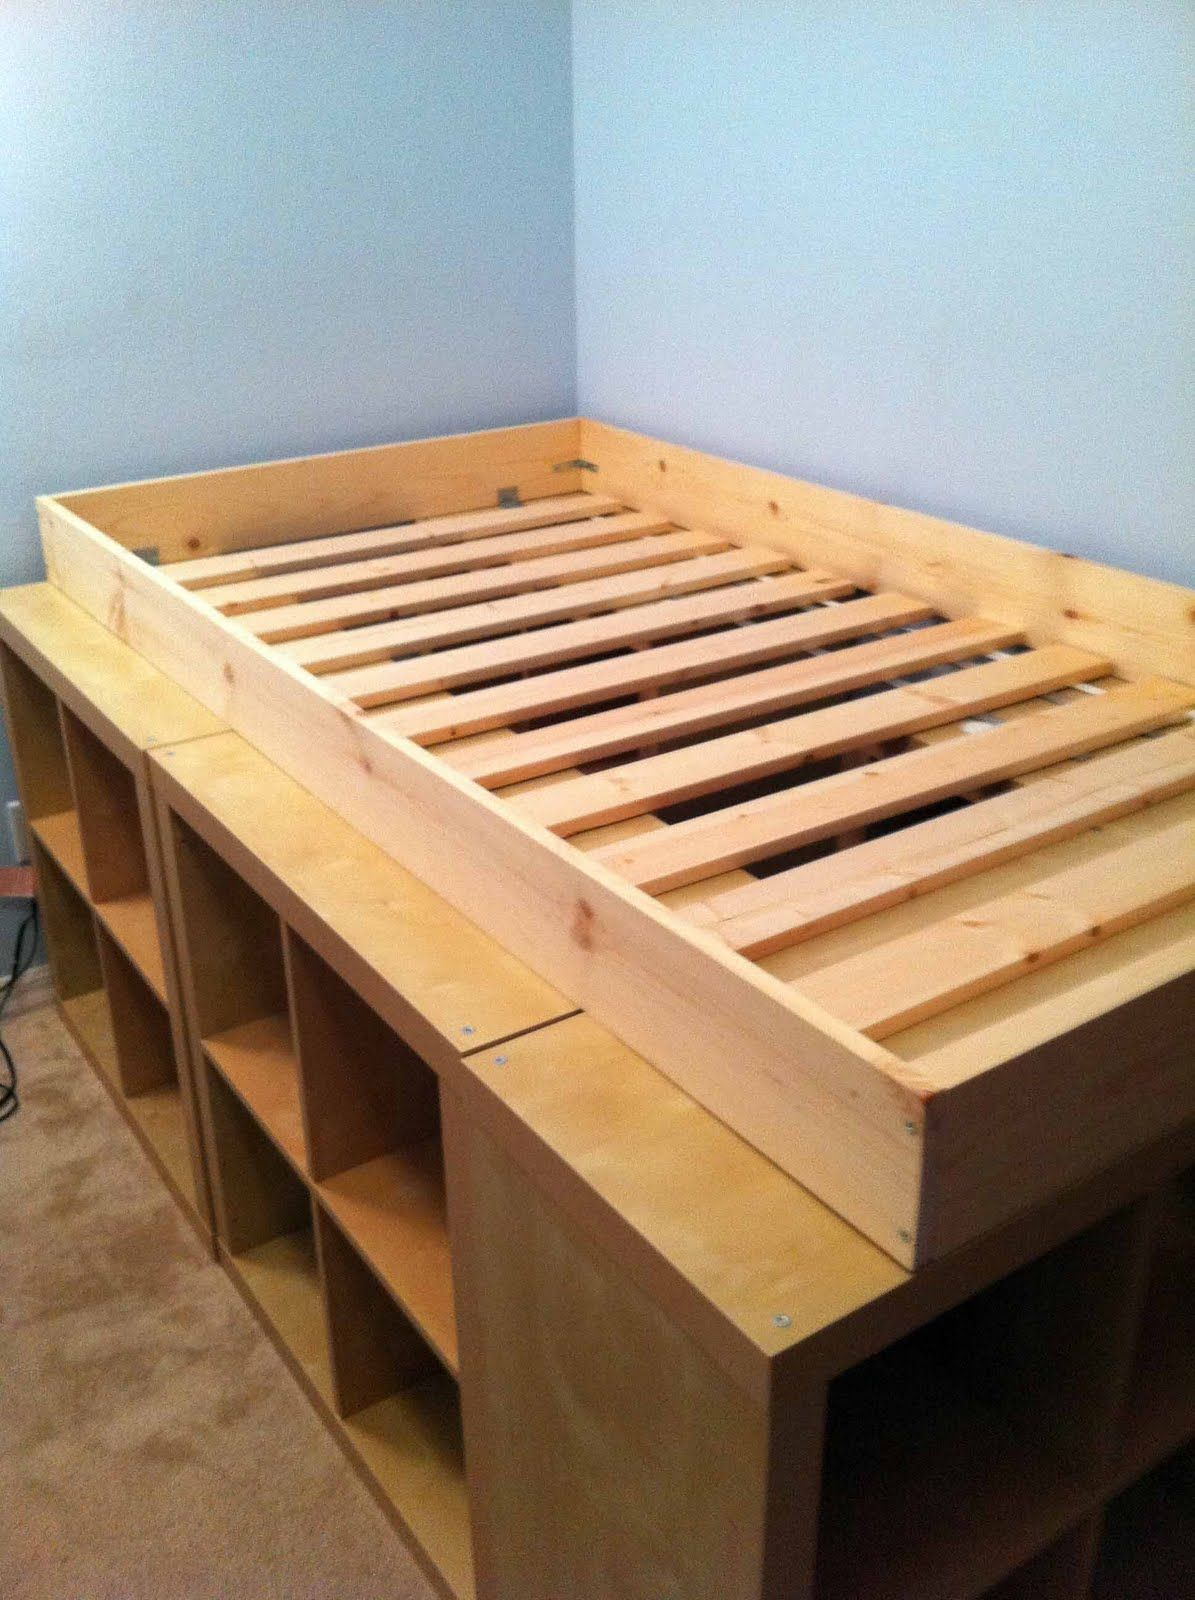 Expedit Storage Bed Ikea Hackers Ikea Bed Diy Bed Storage Bed